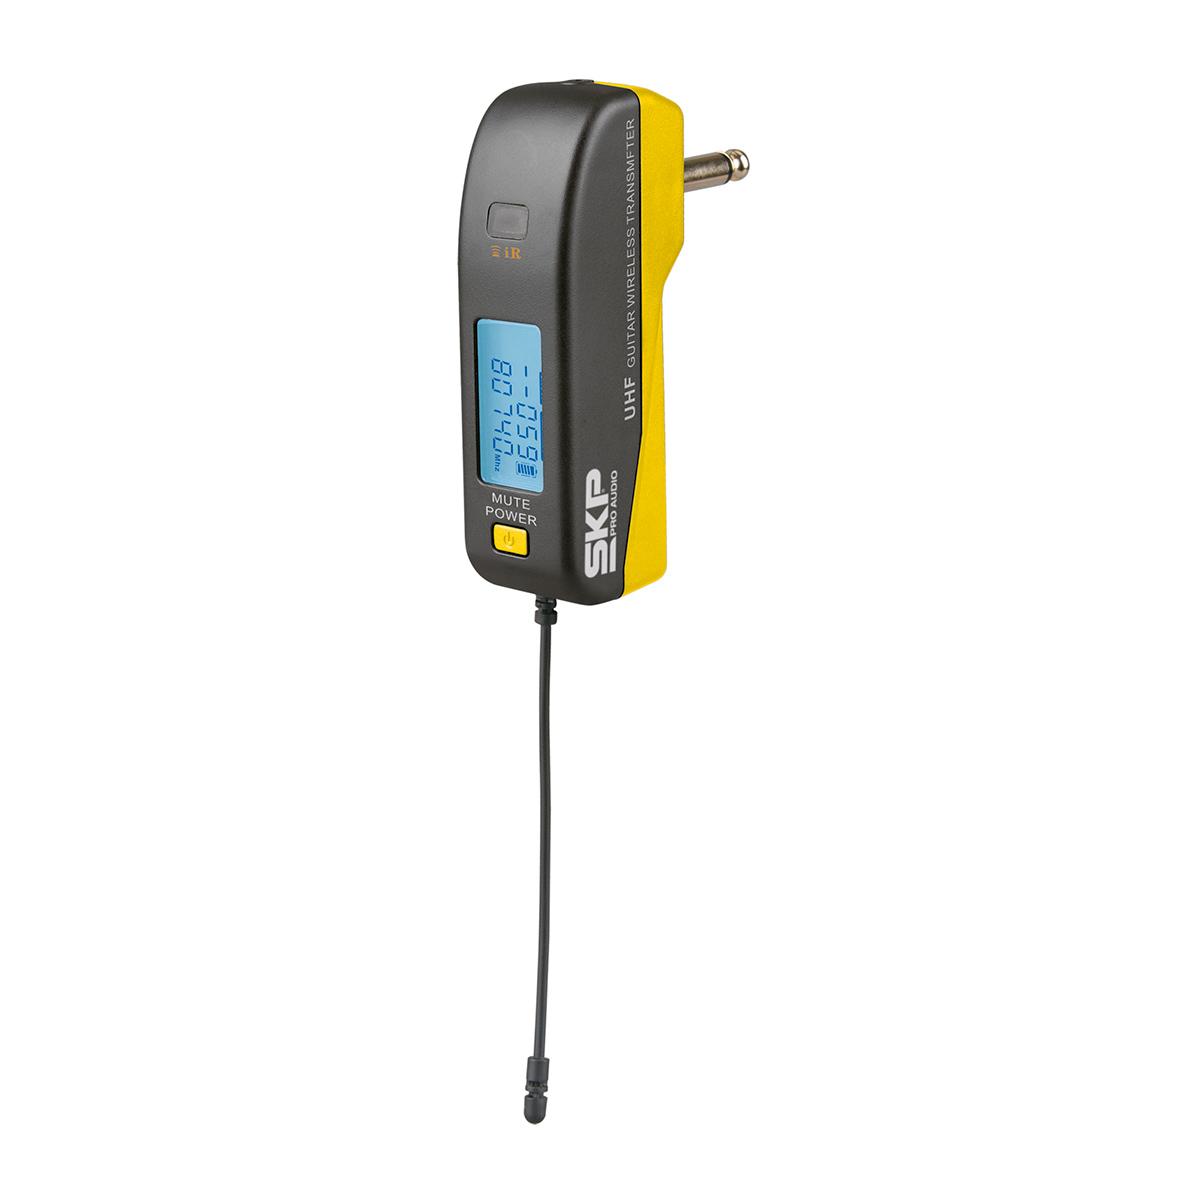 MultisetIII - Microfone s/ Fio de Mão e Transmissor UHF Multiset III - SKP